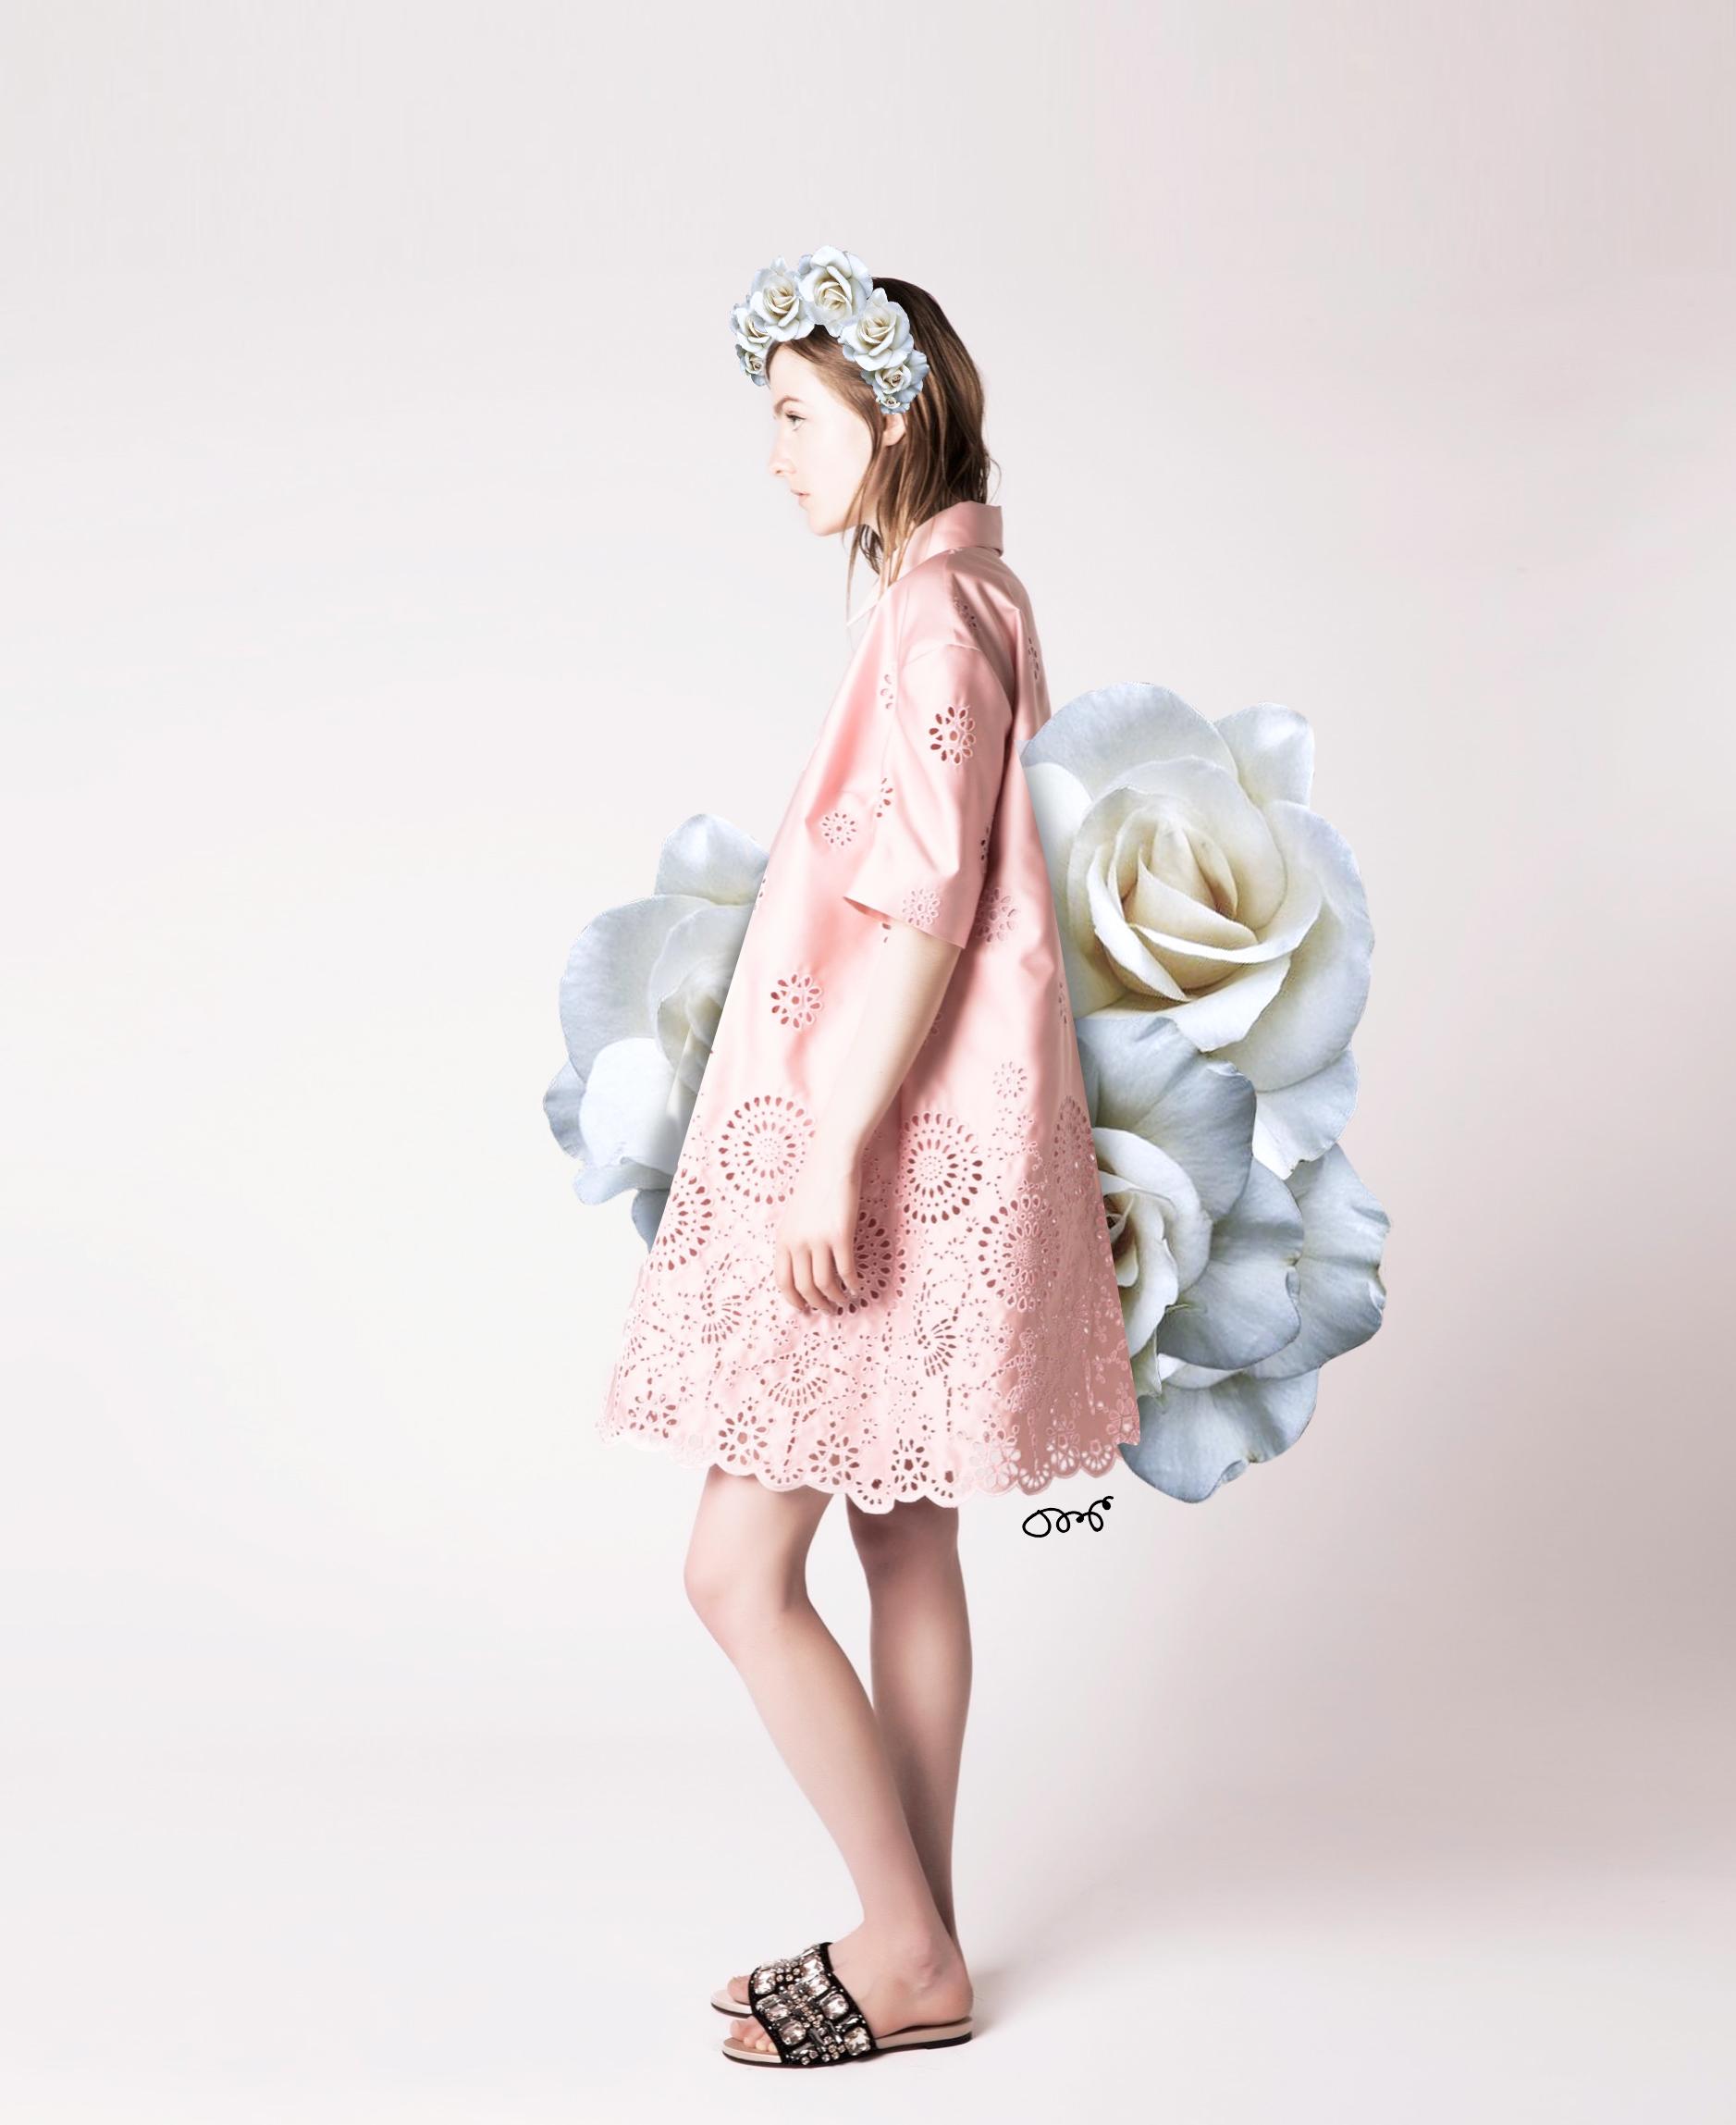 twelveofour-olga-montserrat-rochas-flower-frida-girls-moodboard-2.jpg